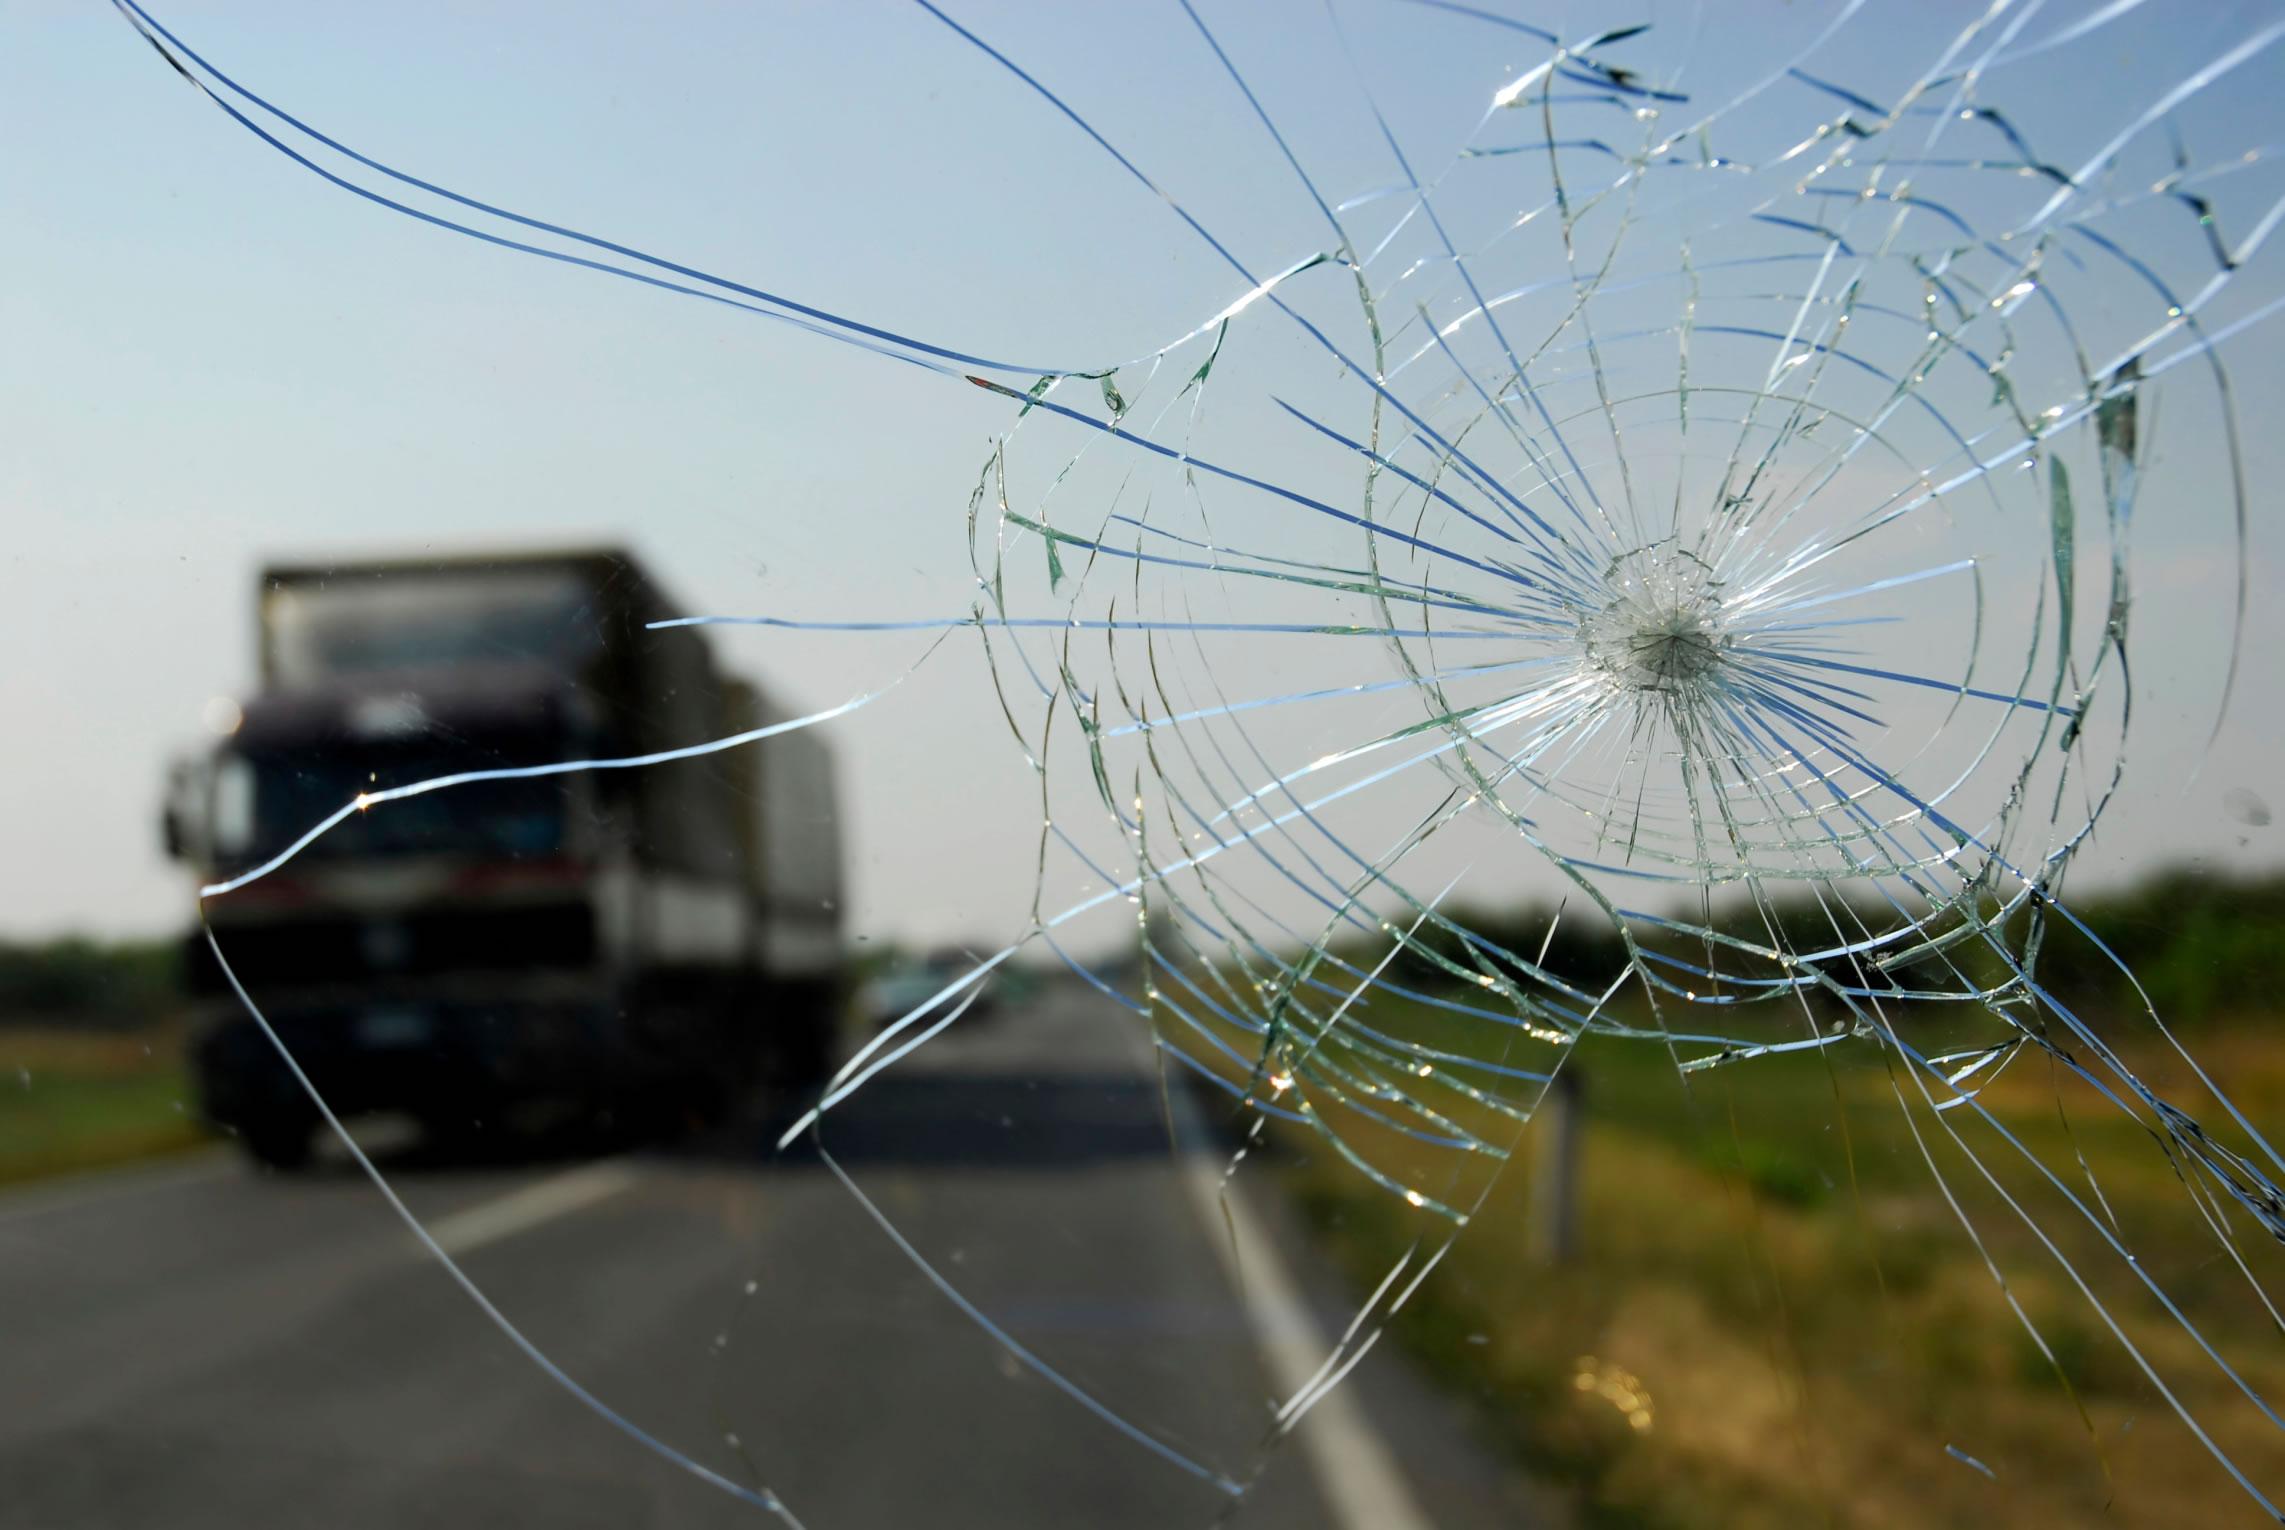 Cracked-windshield-laws.jpg